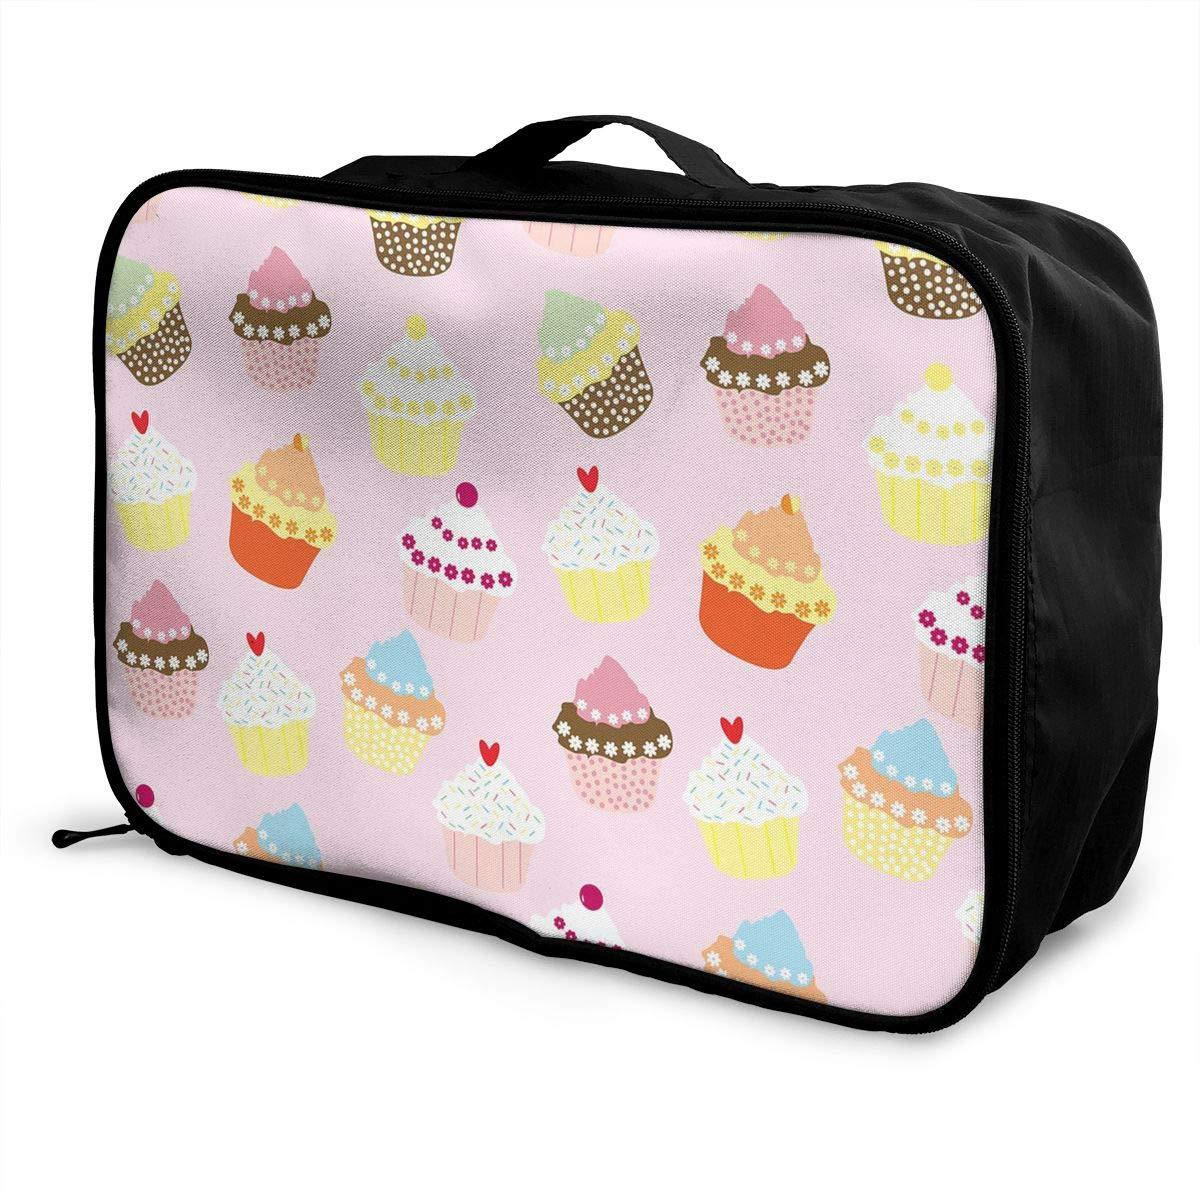 Sweet Cupcakes Travel Bag Best Luggage Bags Duffle Bag Large Capacity Travel Organizer Bag